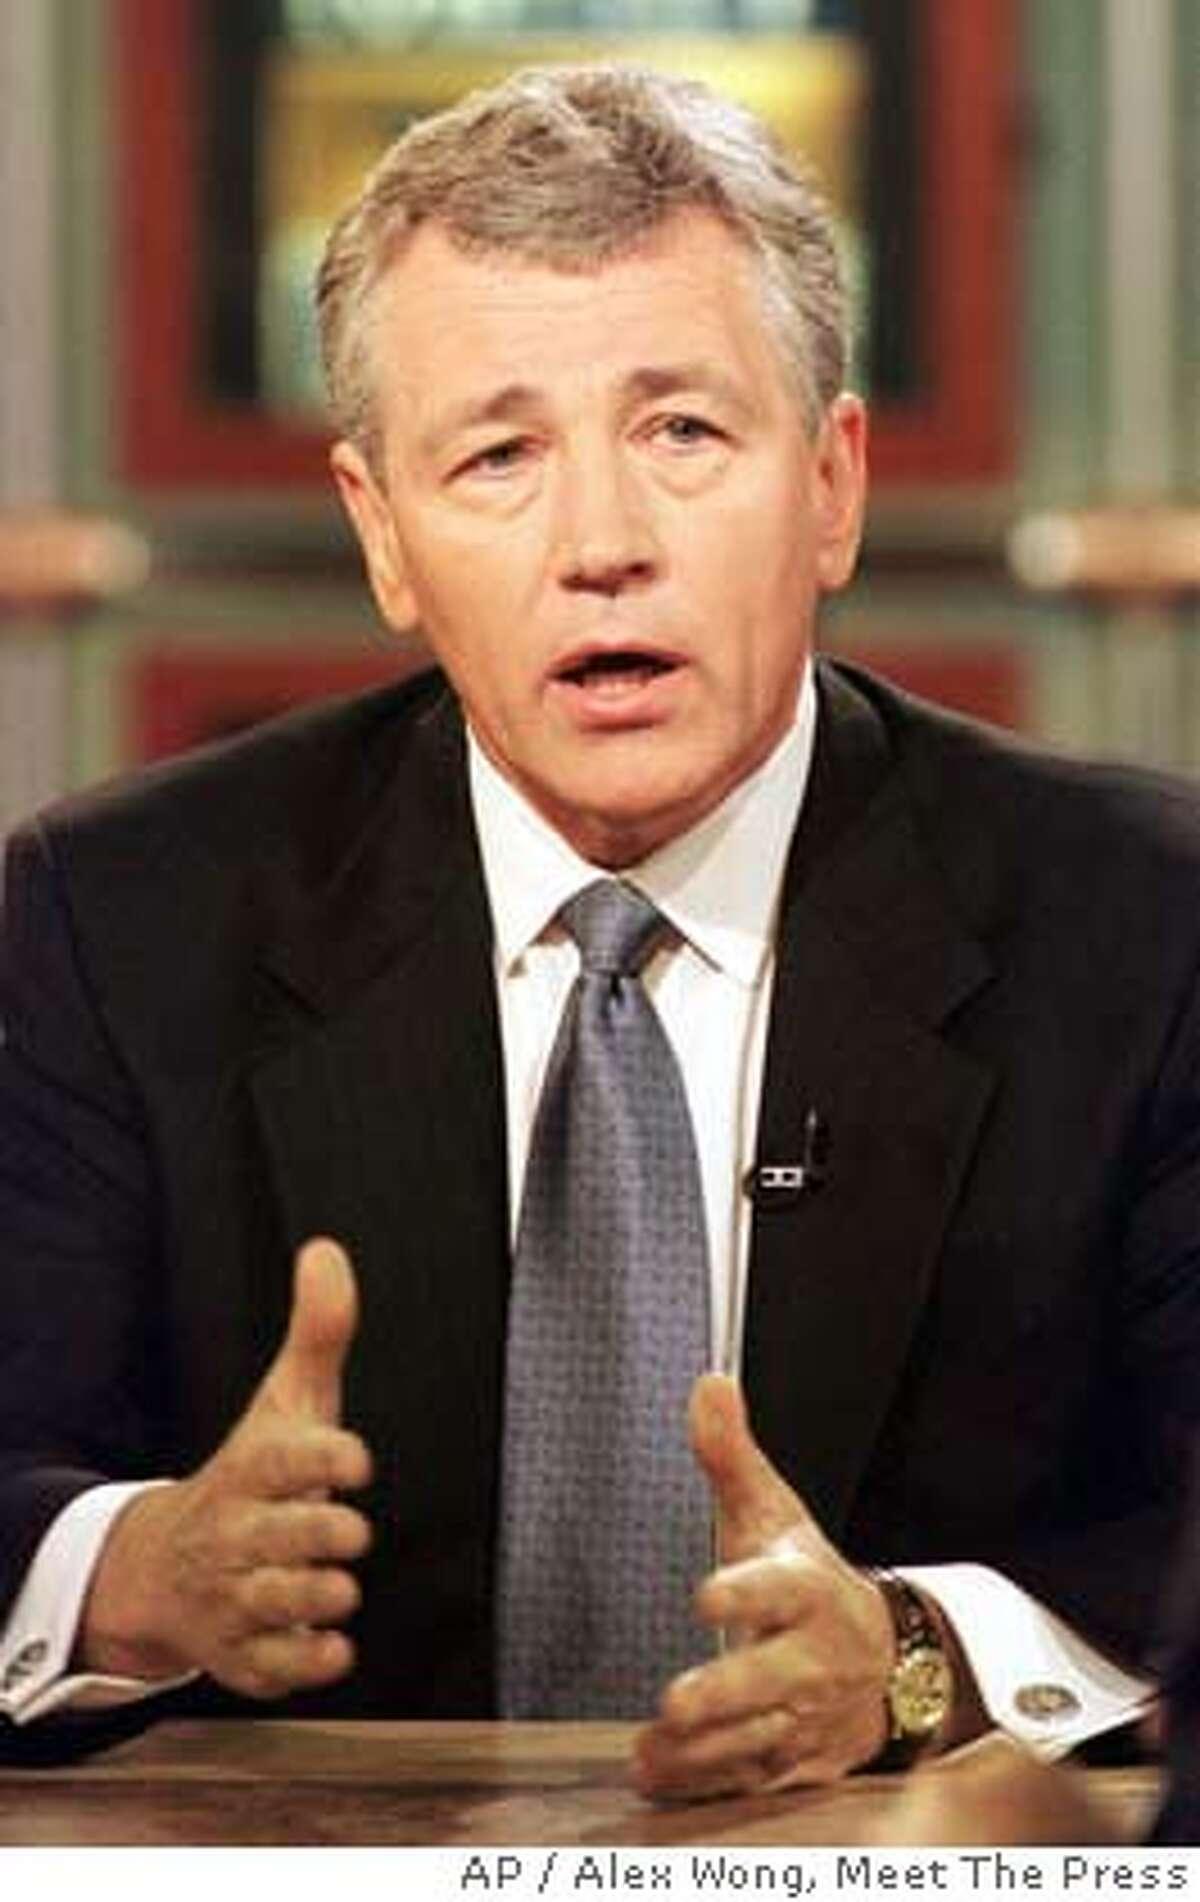 Sen. Chuck Hagel, R-Neb. is shown on the NBC Television show